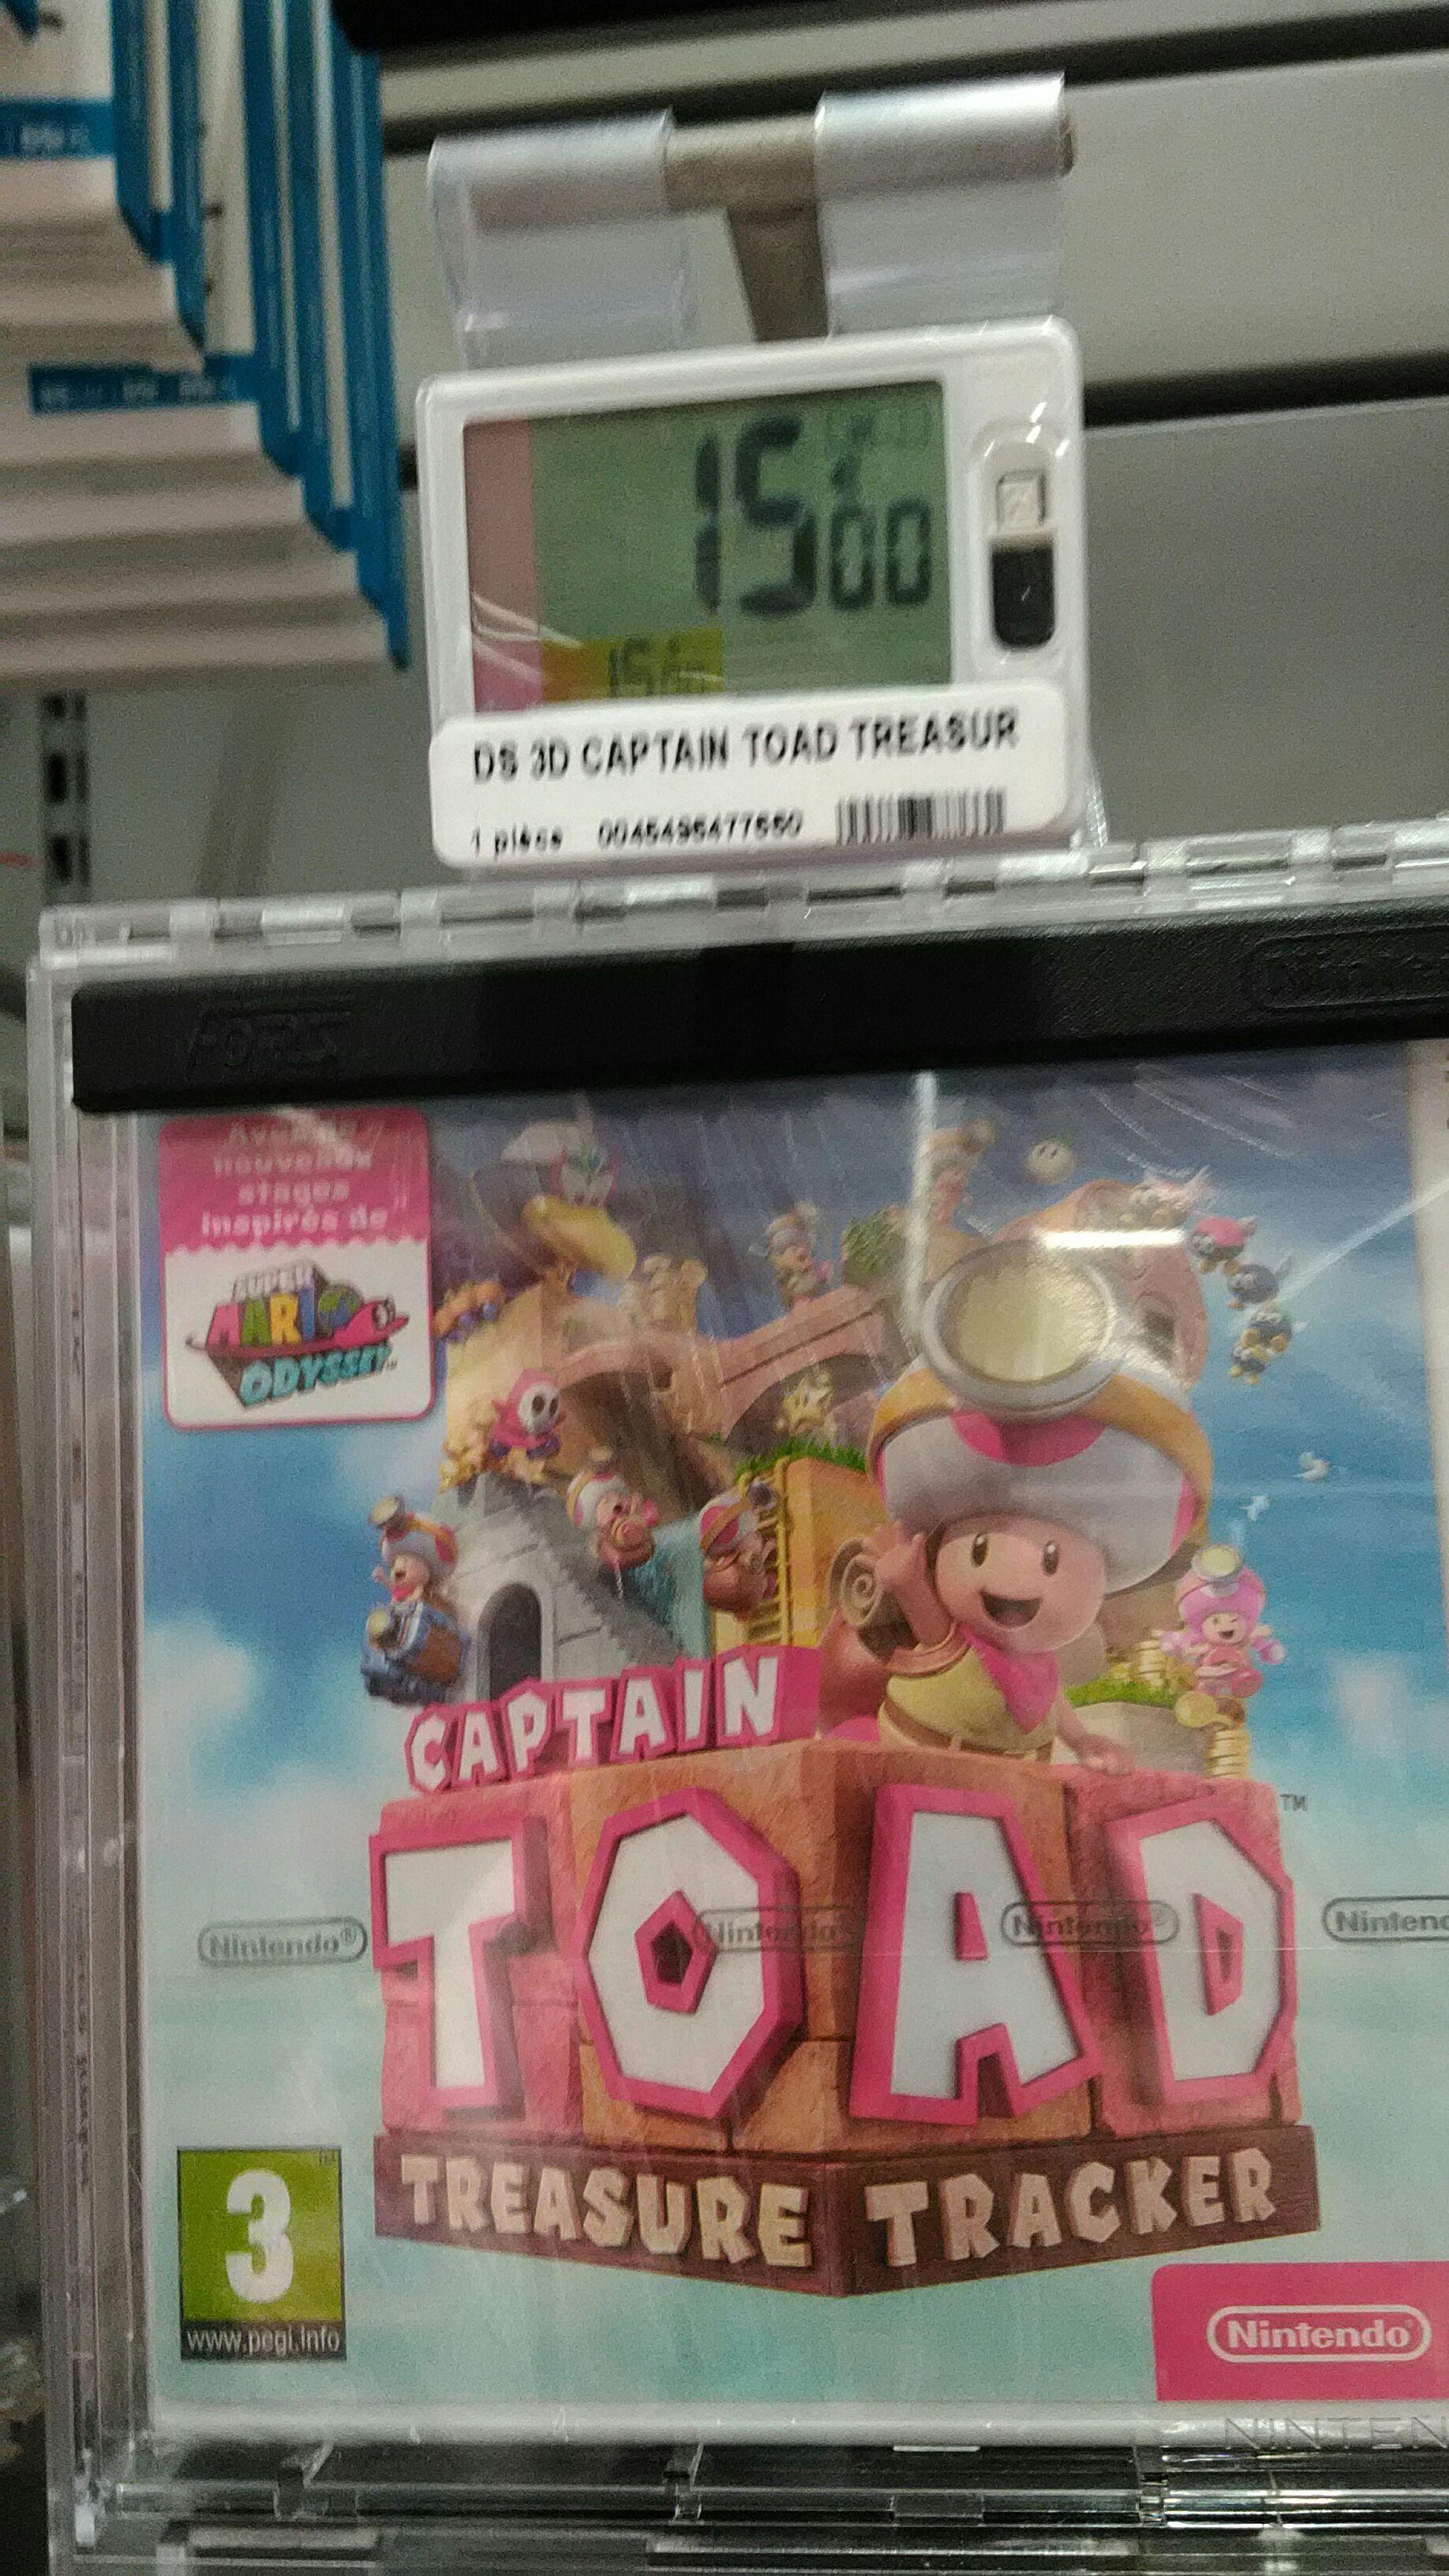 Captain Toad Treasure Tracker sur Nintendo 3DS - Nevers Marzy (58)